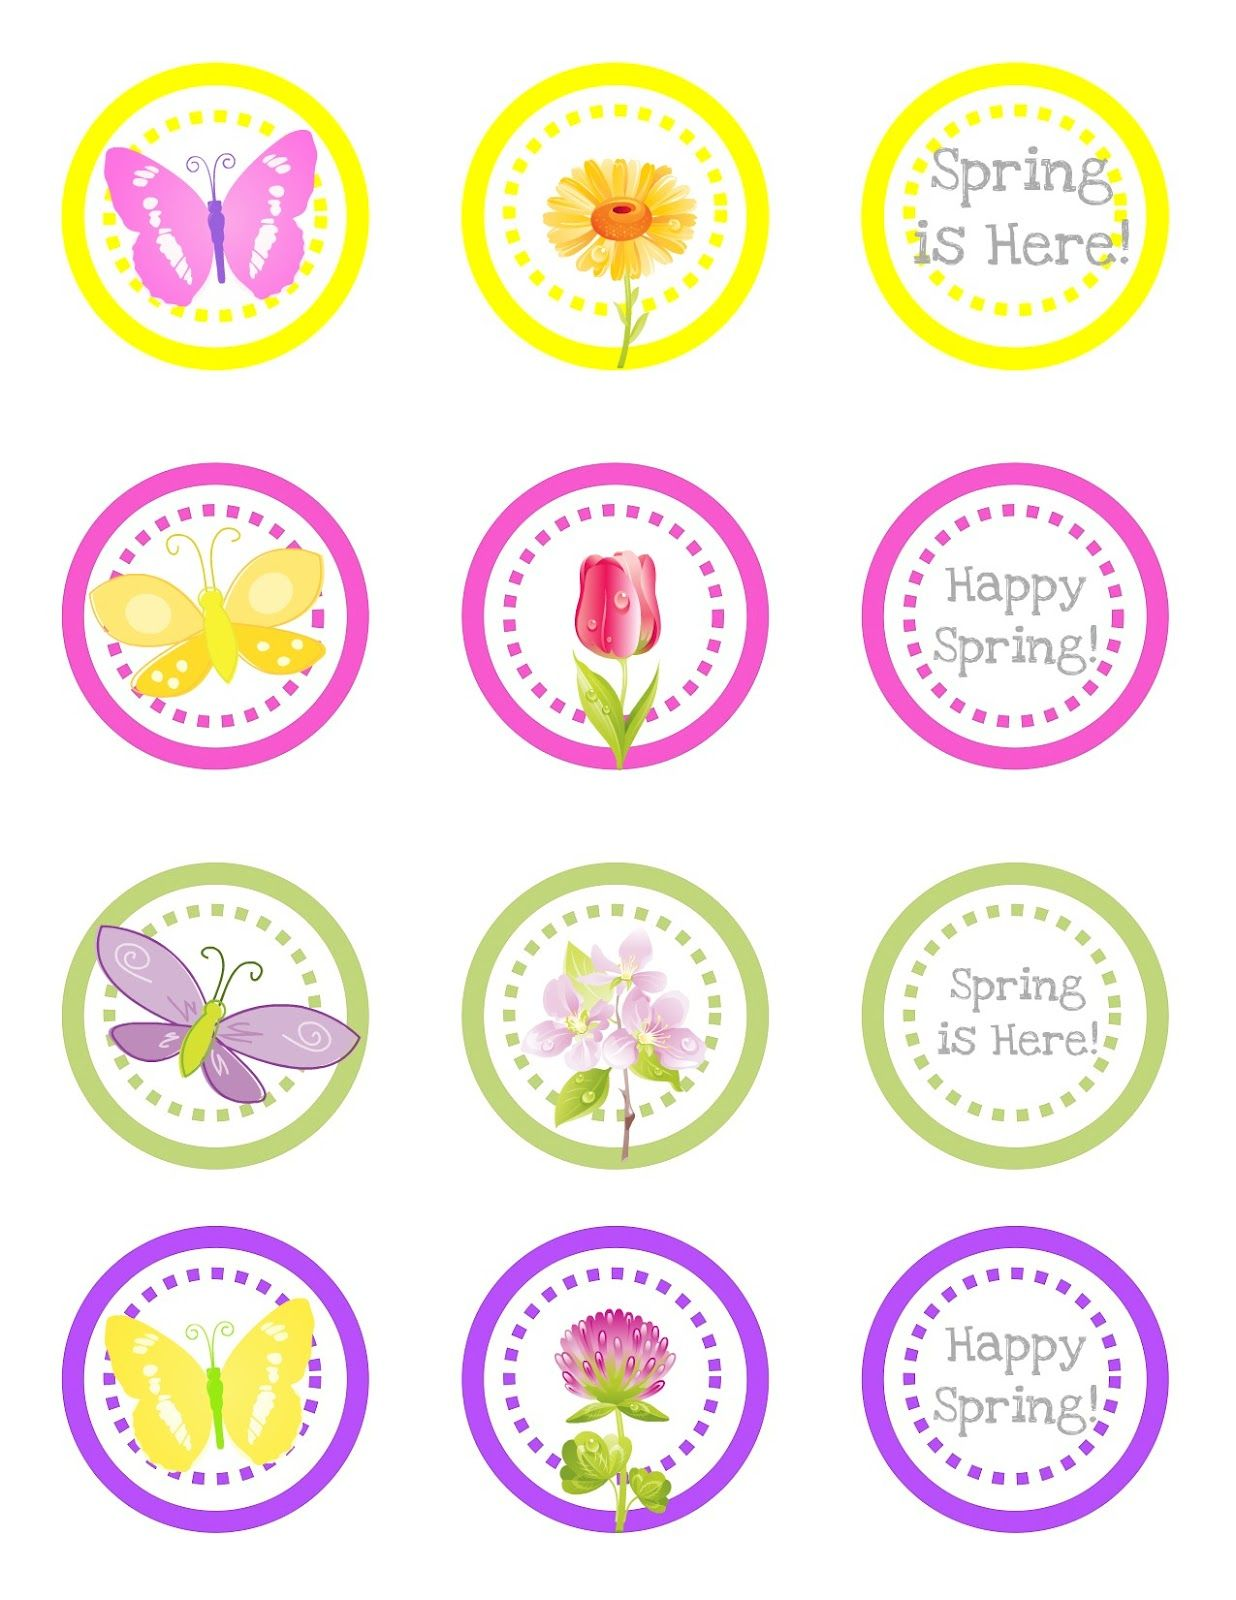 FREE PRINTABLE} april showers bring may flowers printable - Creative ...